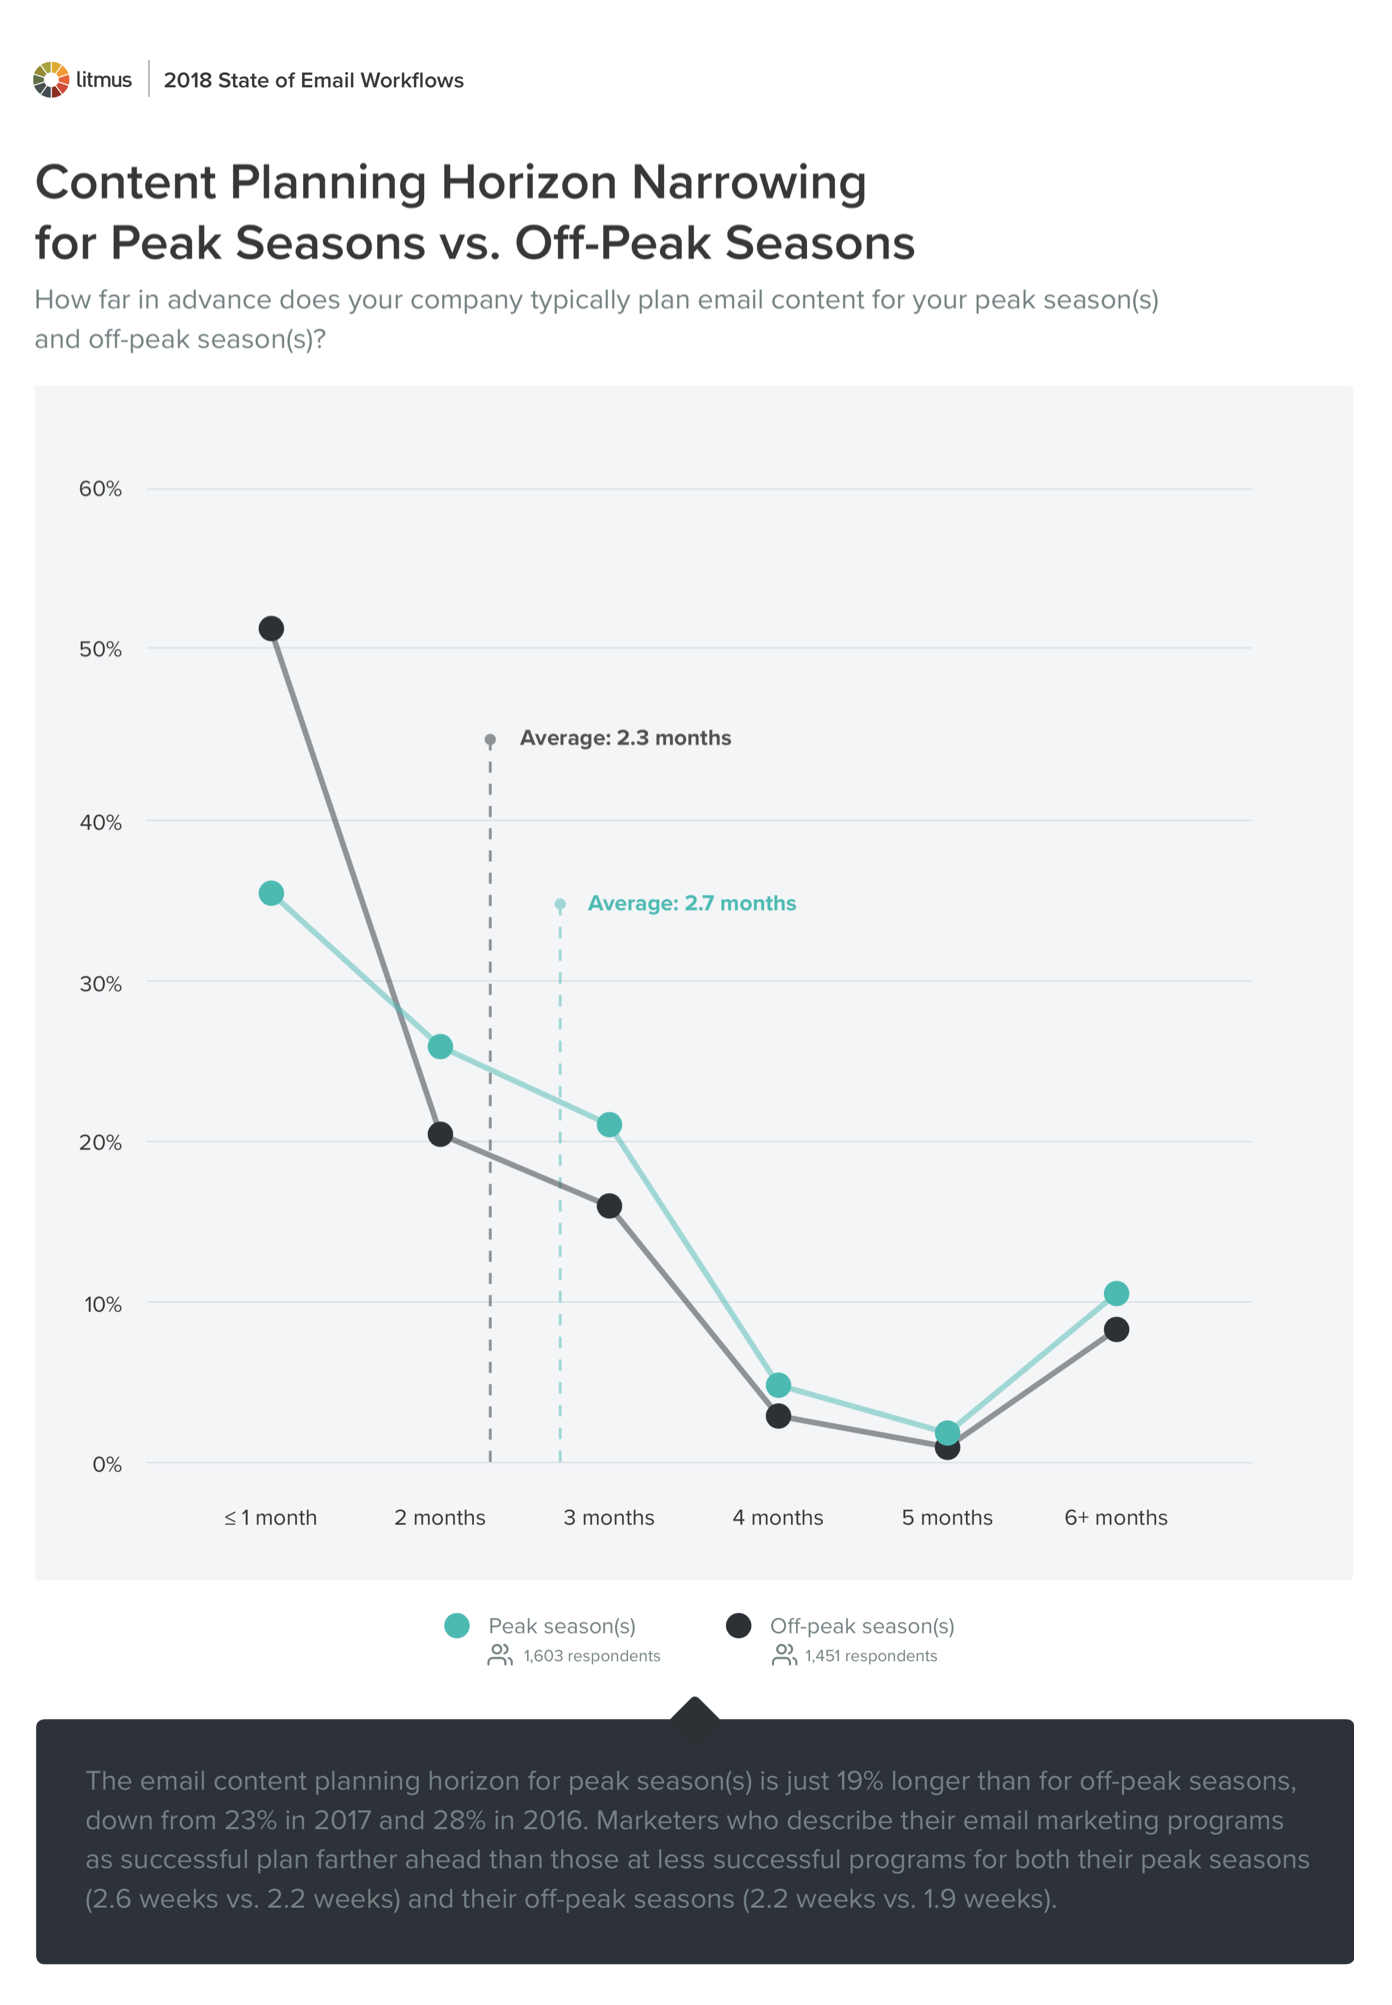 Content Planning Horizon Narrowing for Peak Seasons vs. Off-Peak Seasons